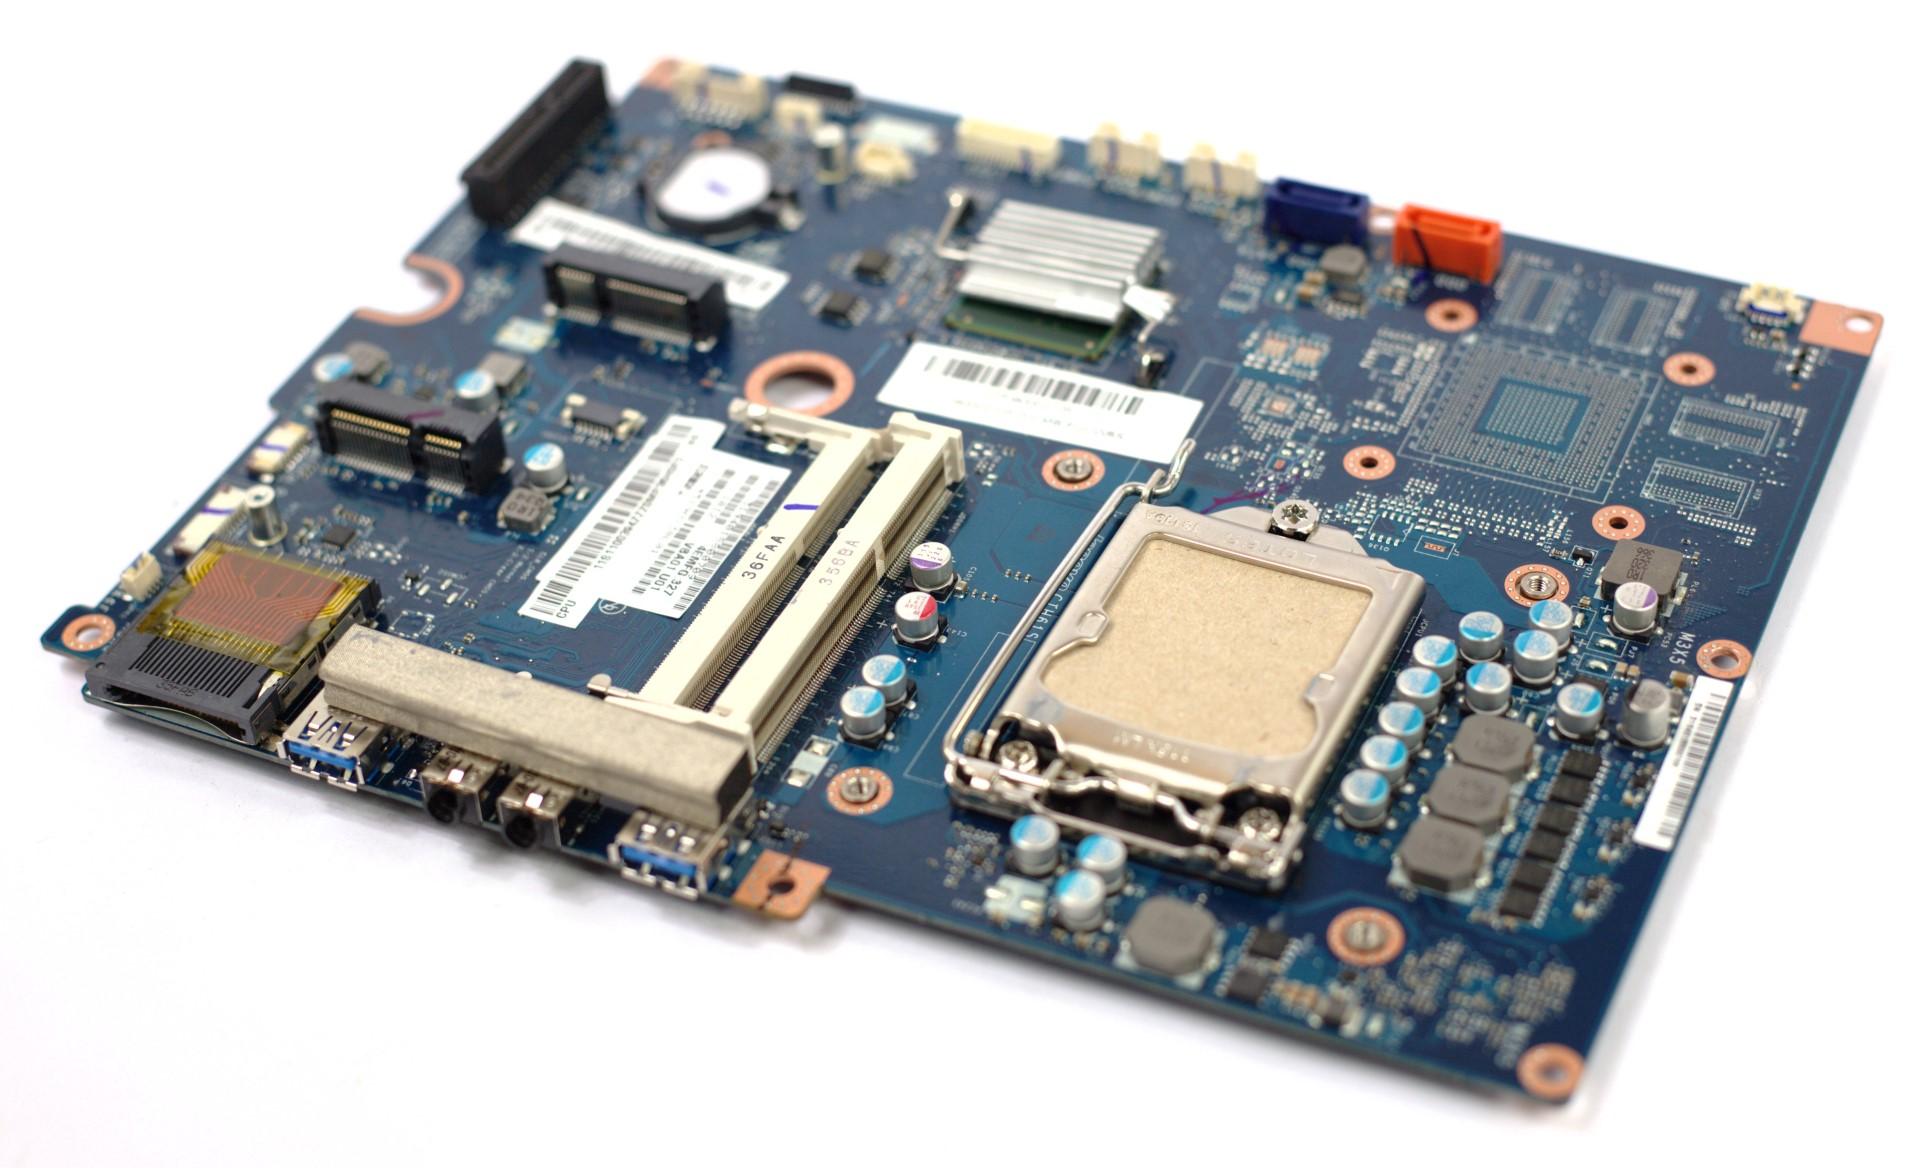 90002705 Lenovo CIH61S LGA1155 Motherboard for C540 AiO LA-9304P Rev:1.0